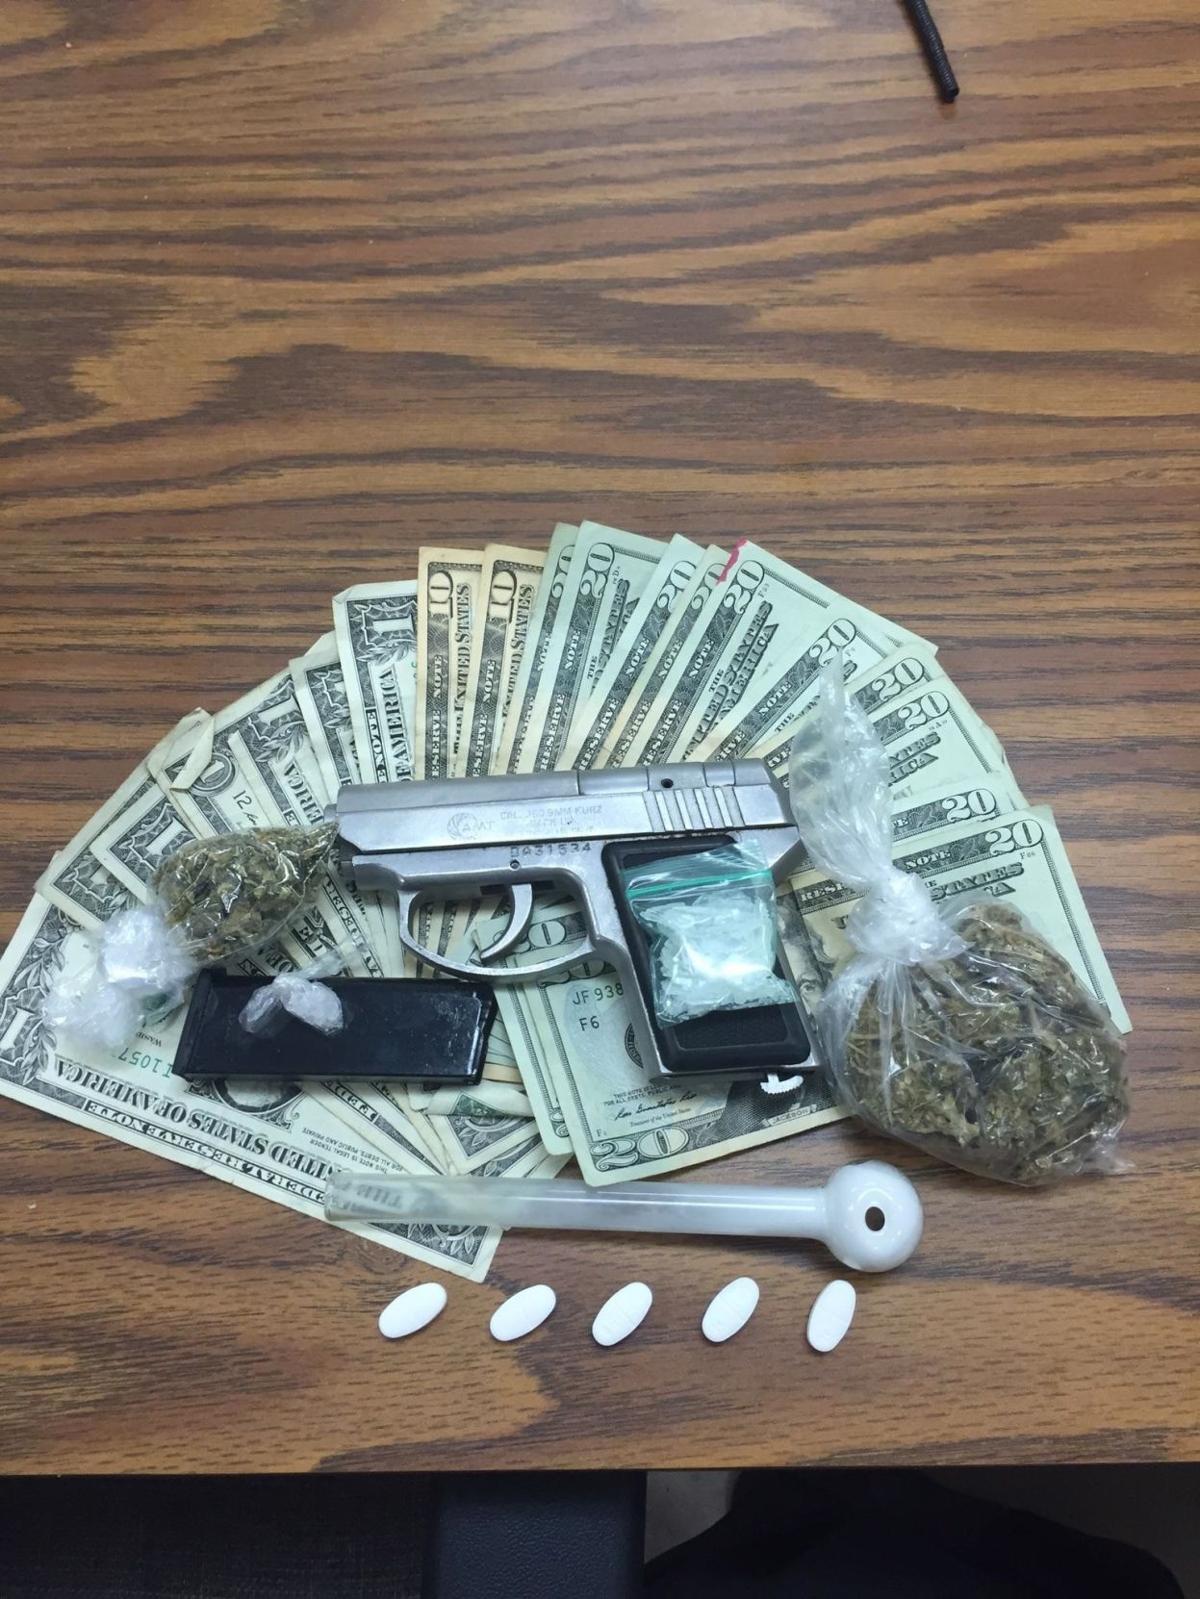 Mix of drugs found at local home   Local News   unionrecorder.com